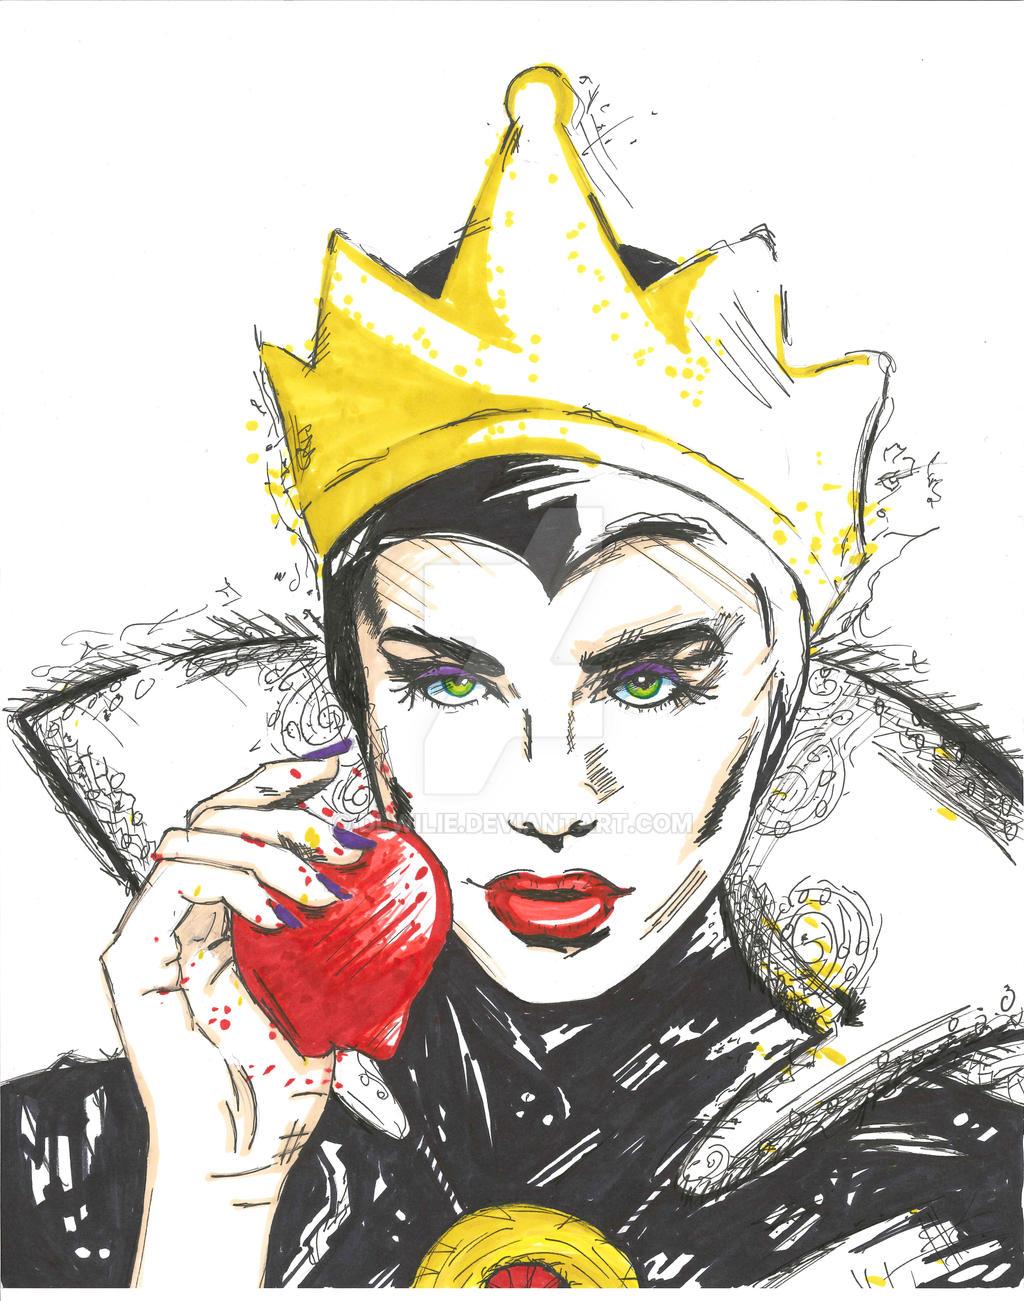 Disney Villains 1 - The Evil Queen by dlwilie on DeviantArtDisney Evil Queen Art